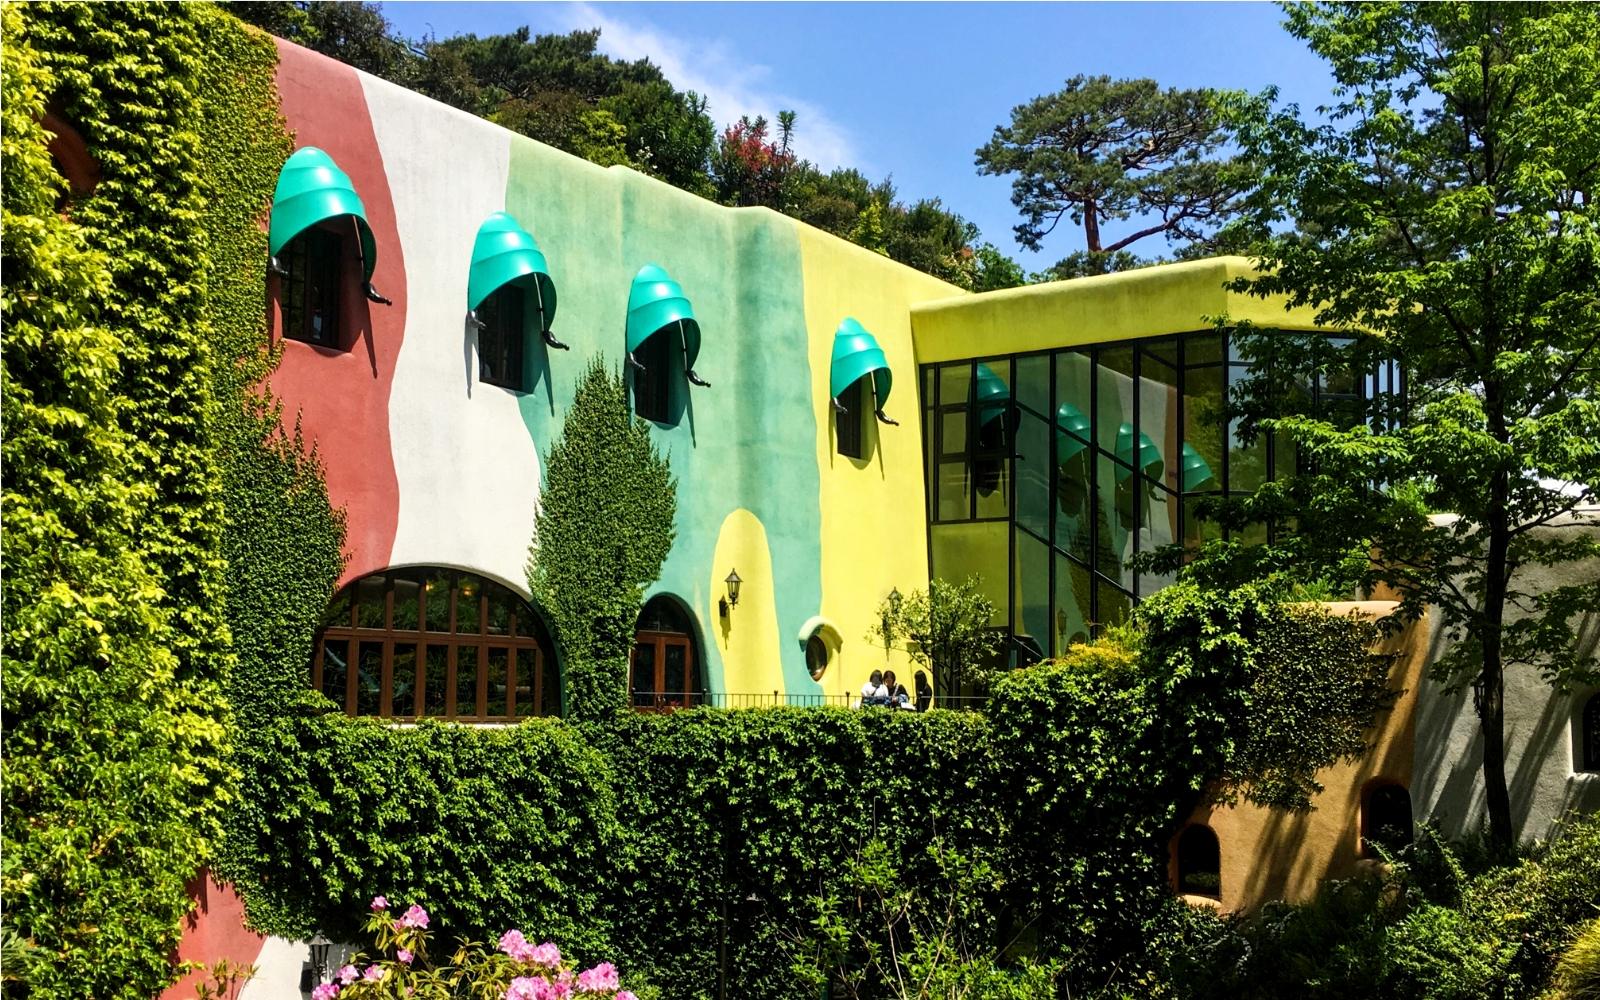 Exterior - Exploring the Studio Ghibli Museum